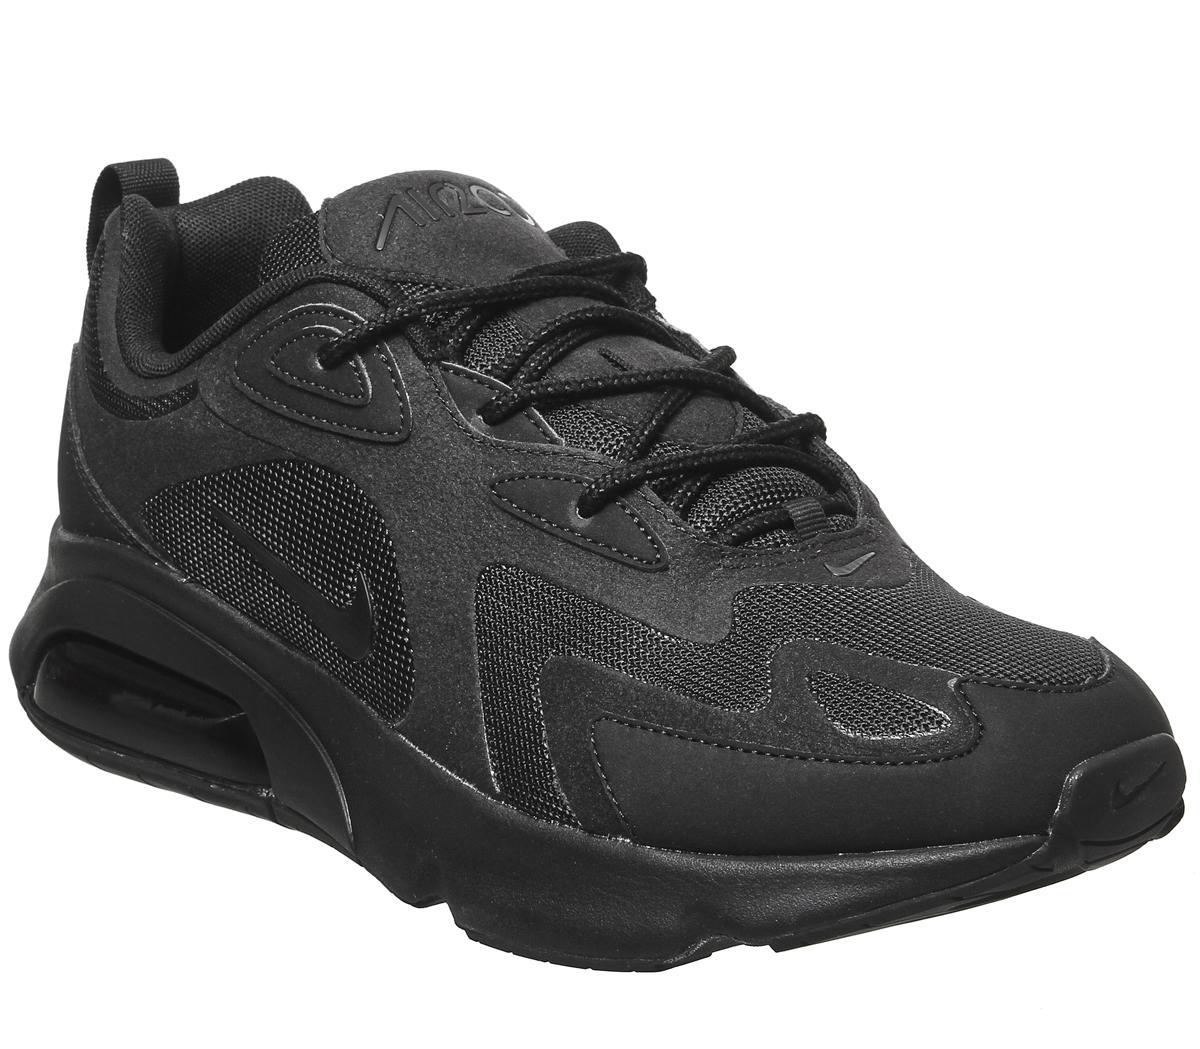 Nike Air Max 200 Trainers Black - His